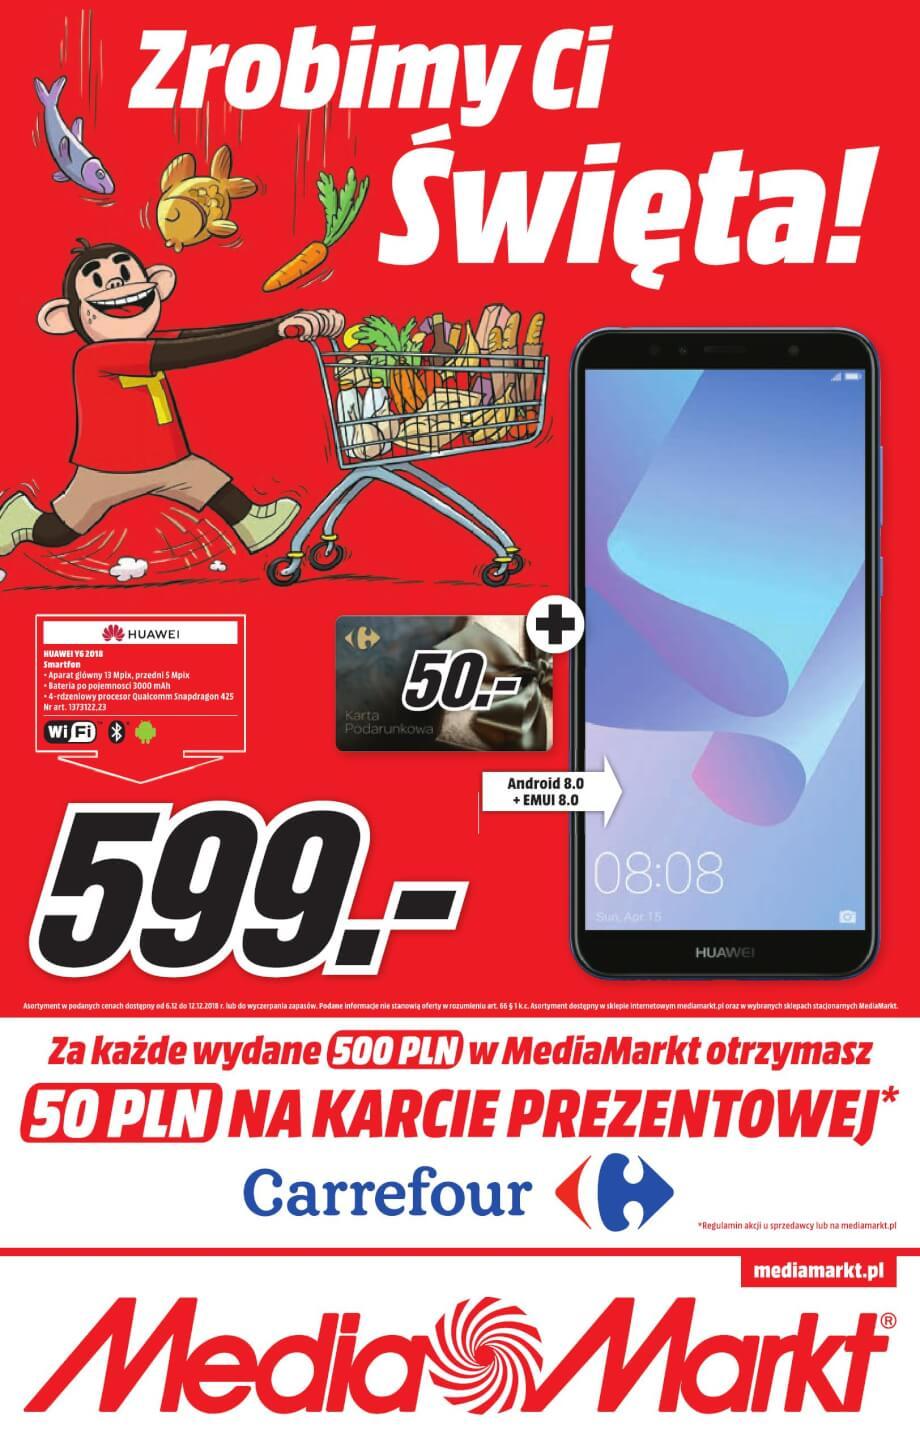 Media Markt, gazetka do 12.12.2018